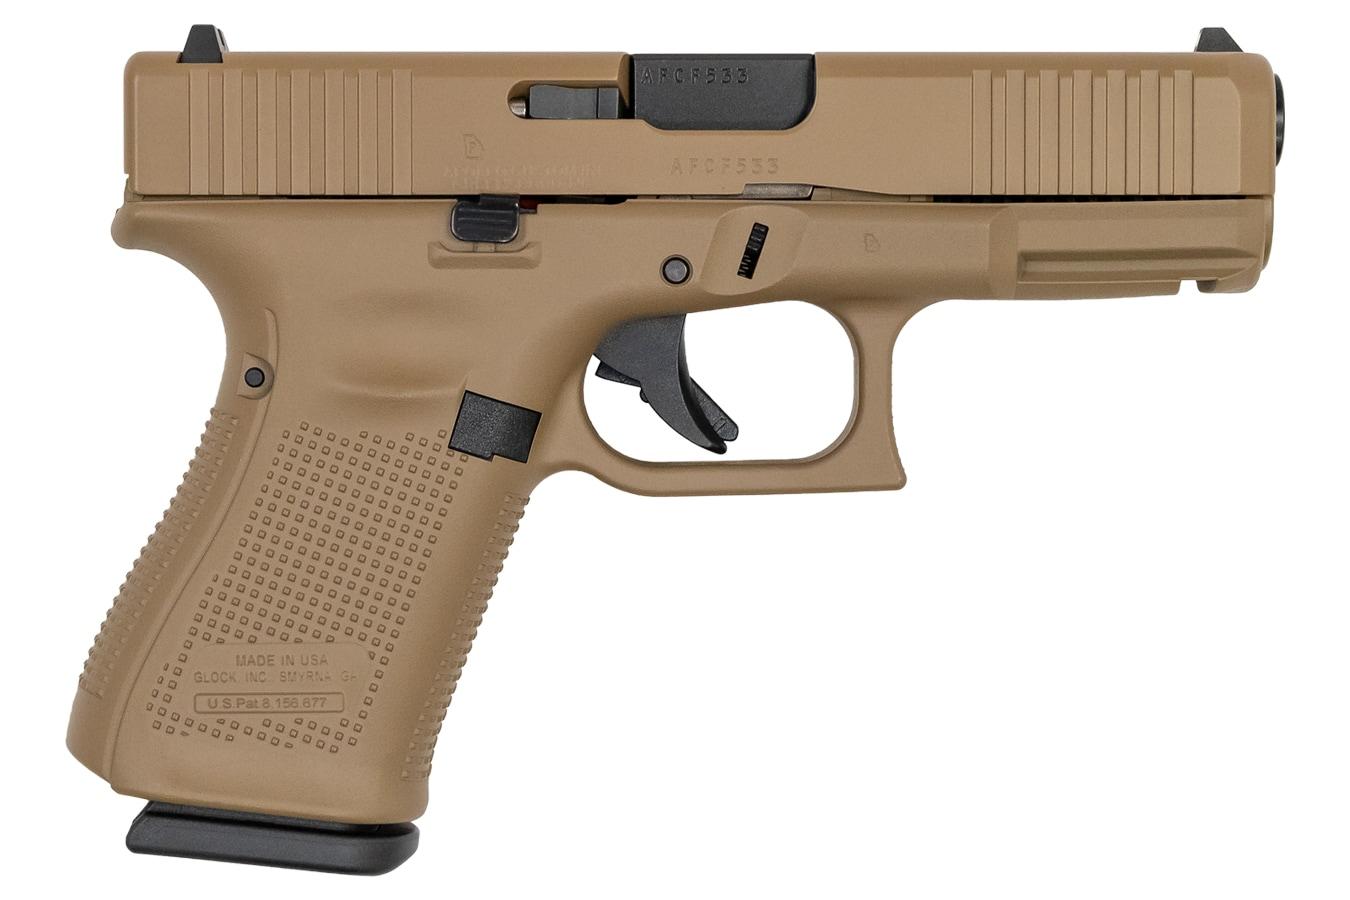 Apollo Custom|Glock G19 Gen 5